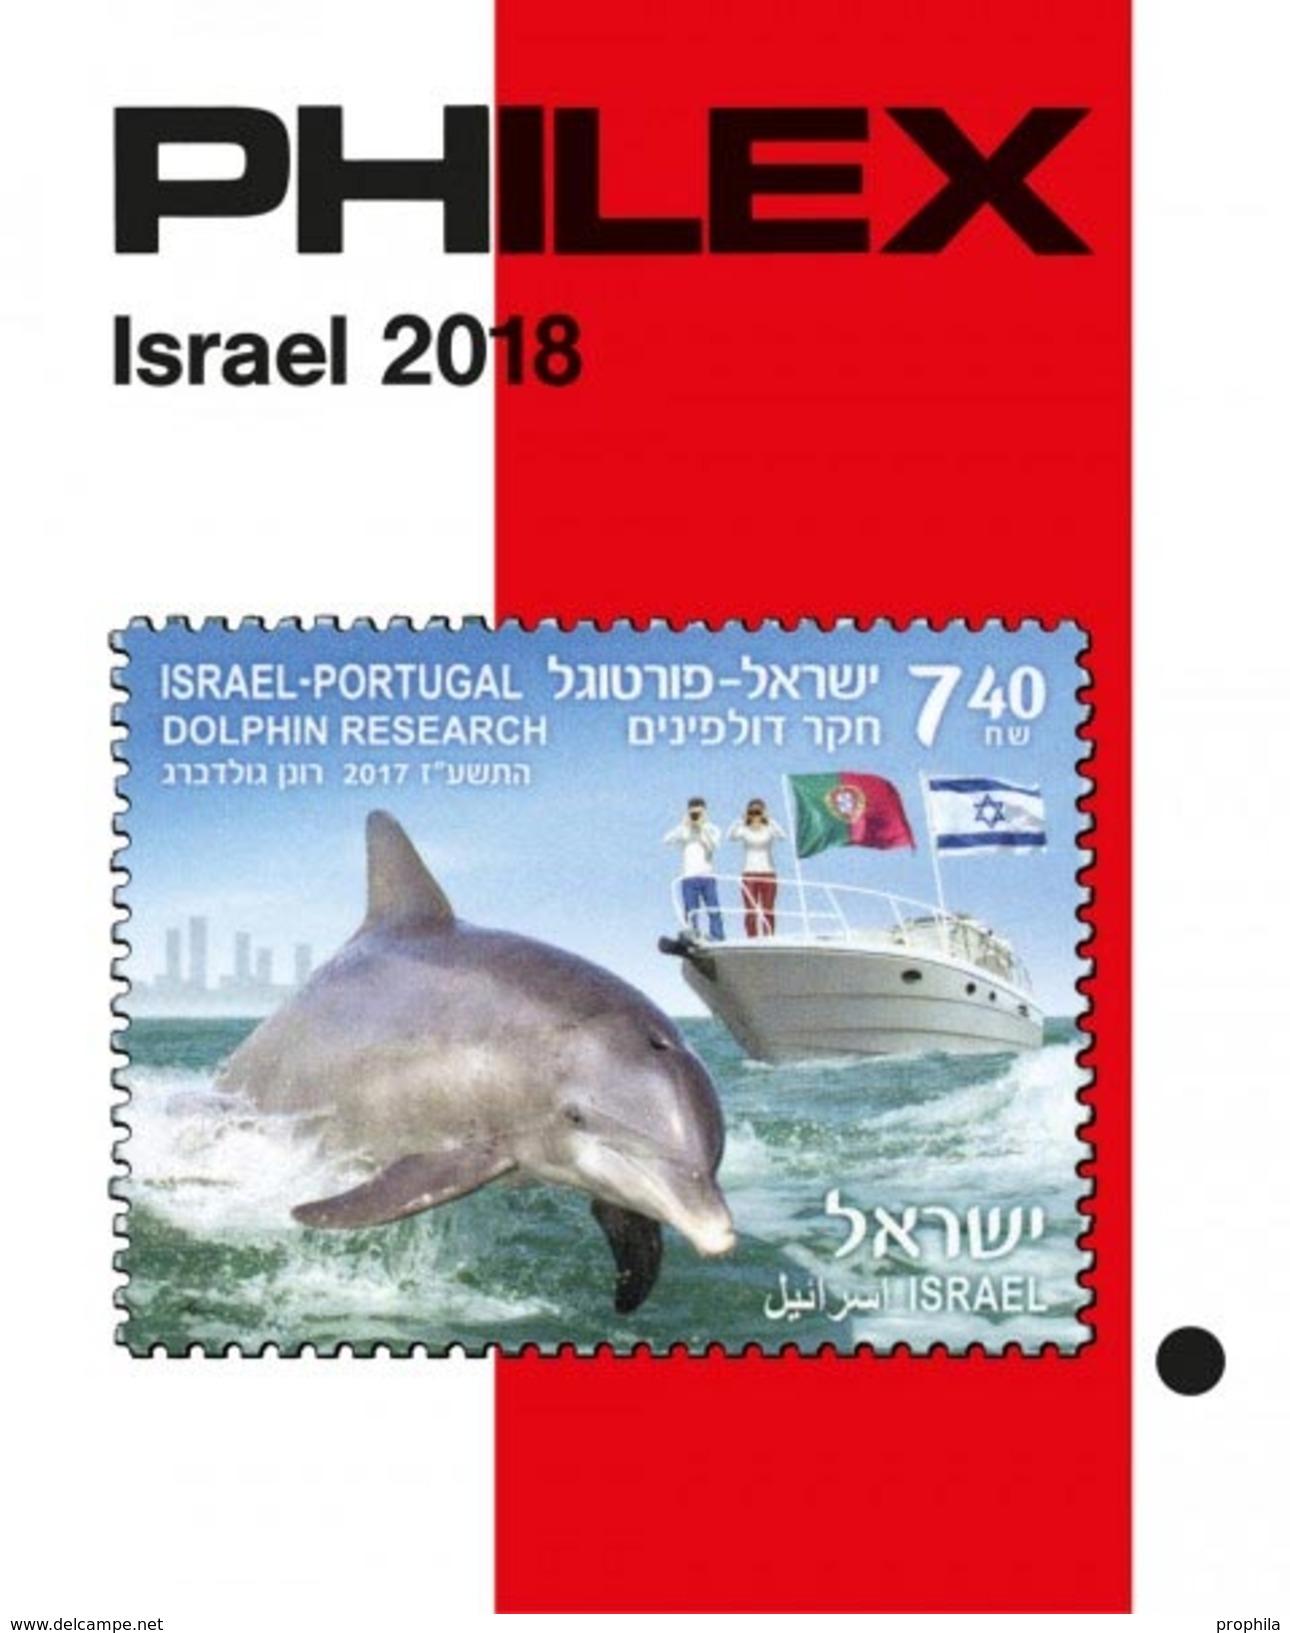 PHILEX Israel 2018 - Altri